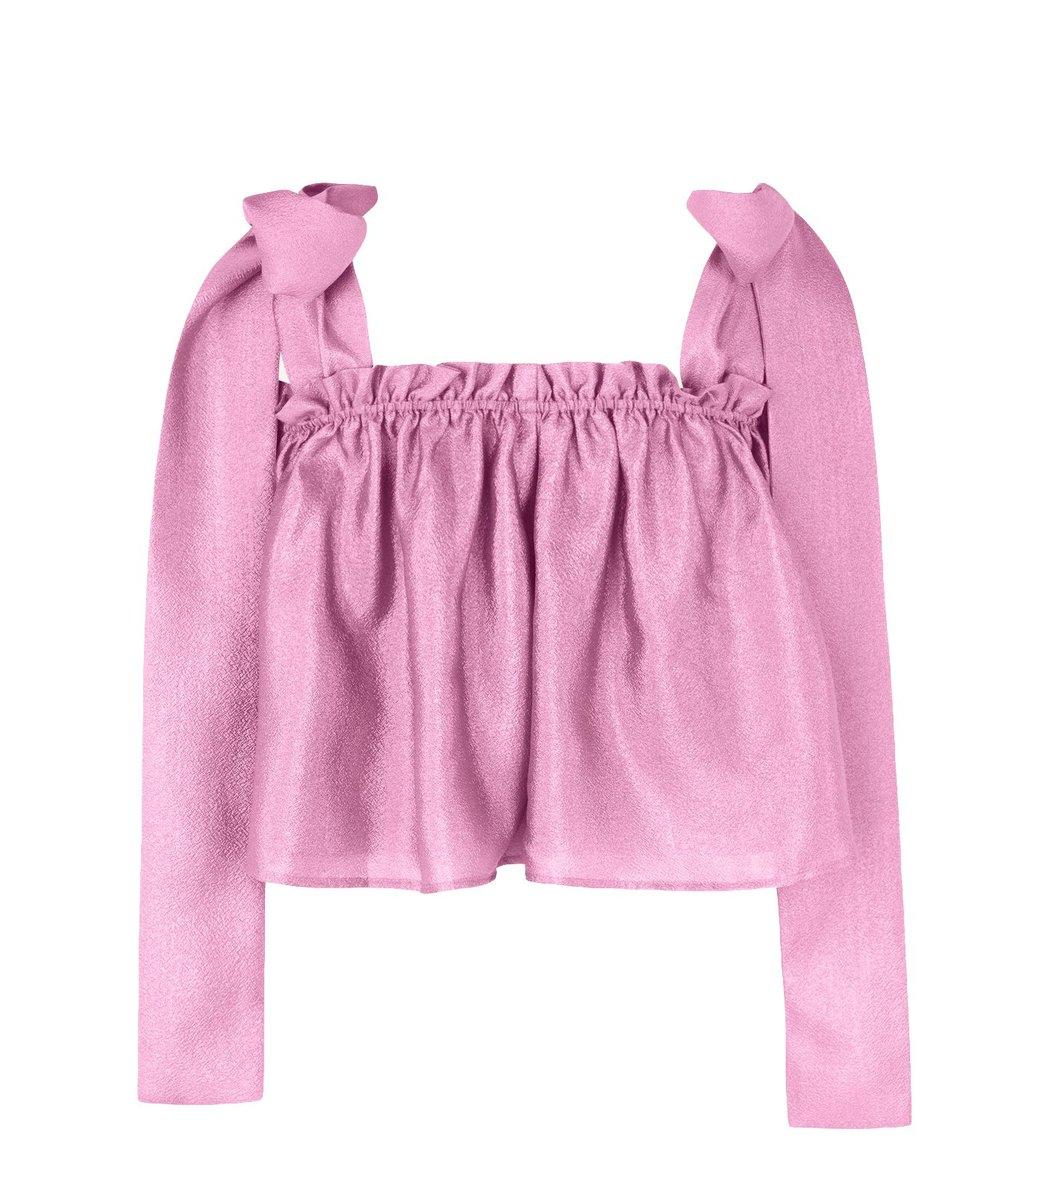 Stine Goya Gia Top in Pink